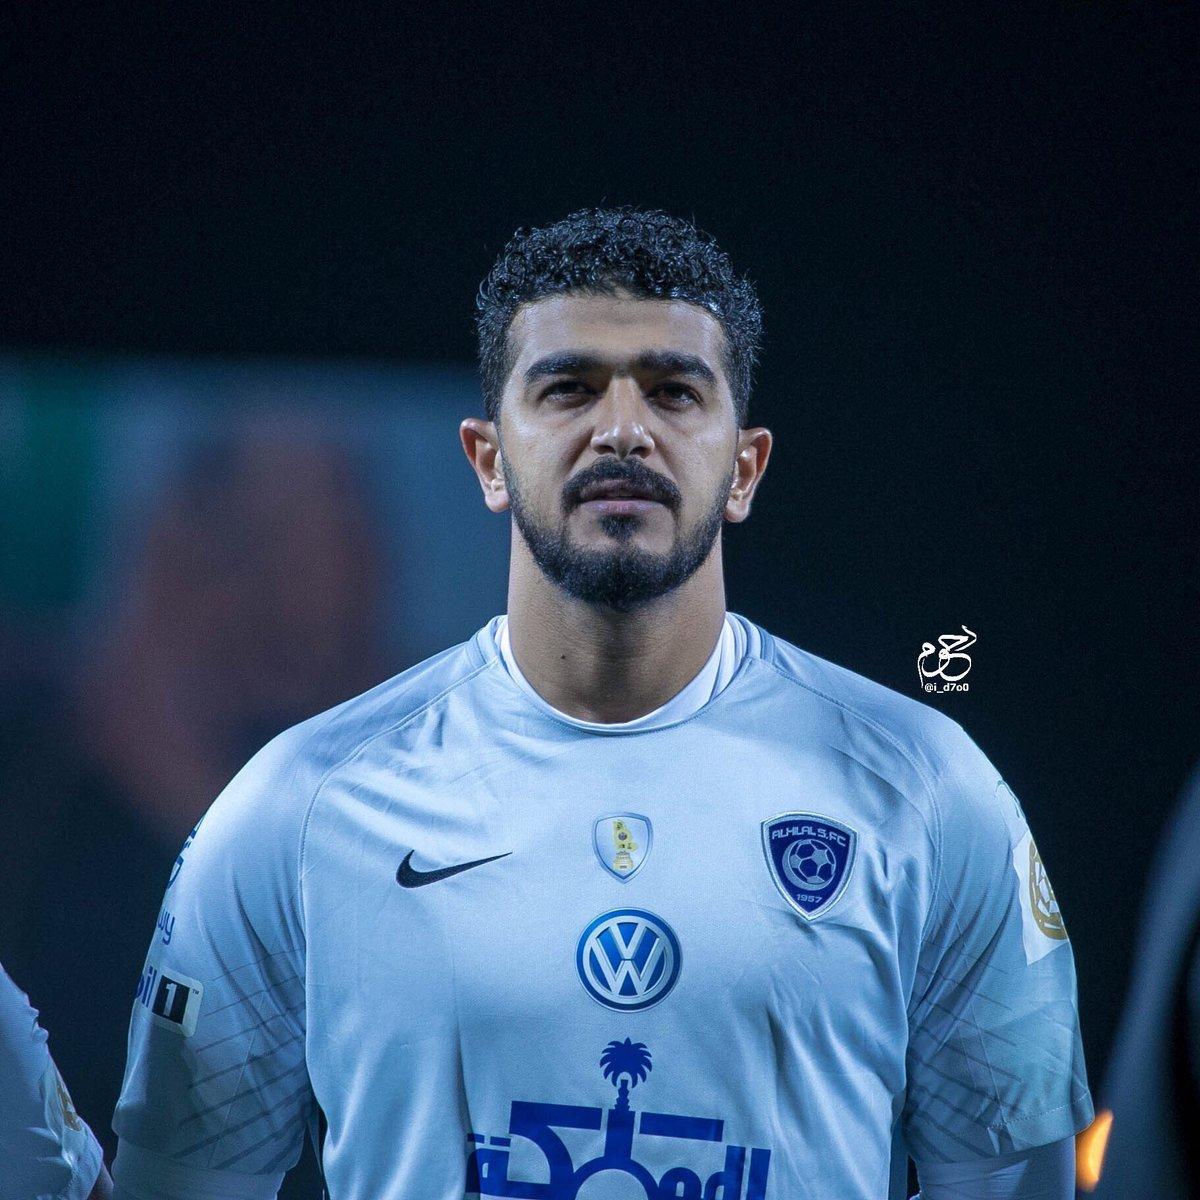 RT @hilalstuff: يعود عبدالله المعيوف لتدريبات الفريق بعد ان أنهى برنامجه التدريبي تحت إشراف كان 👍🏻💙. #الهلال https://t.co/Fz9igGXtwI